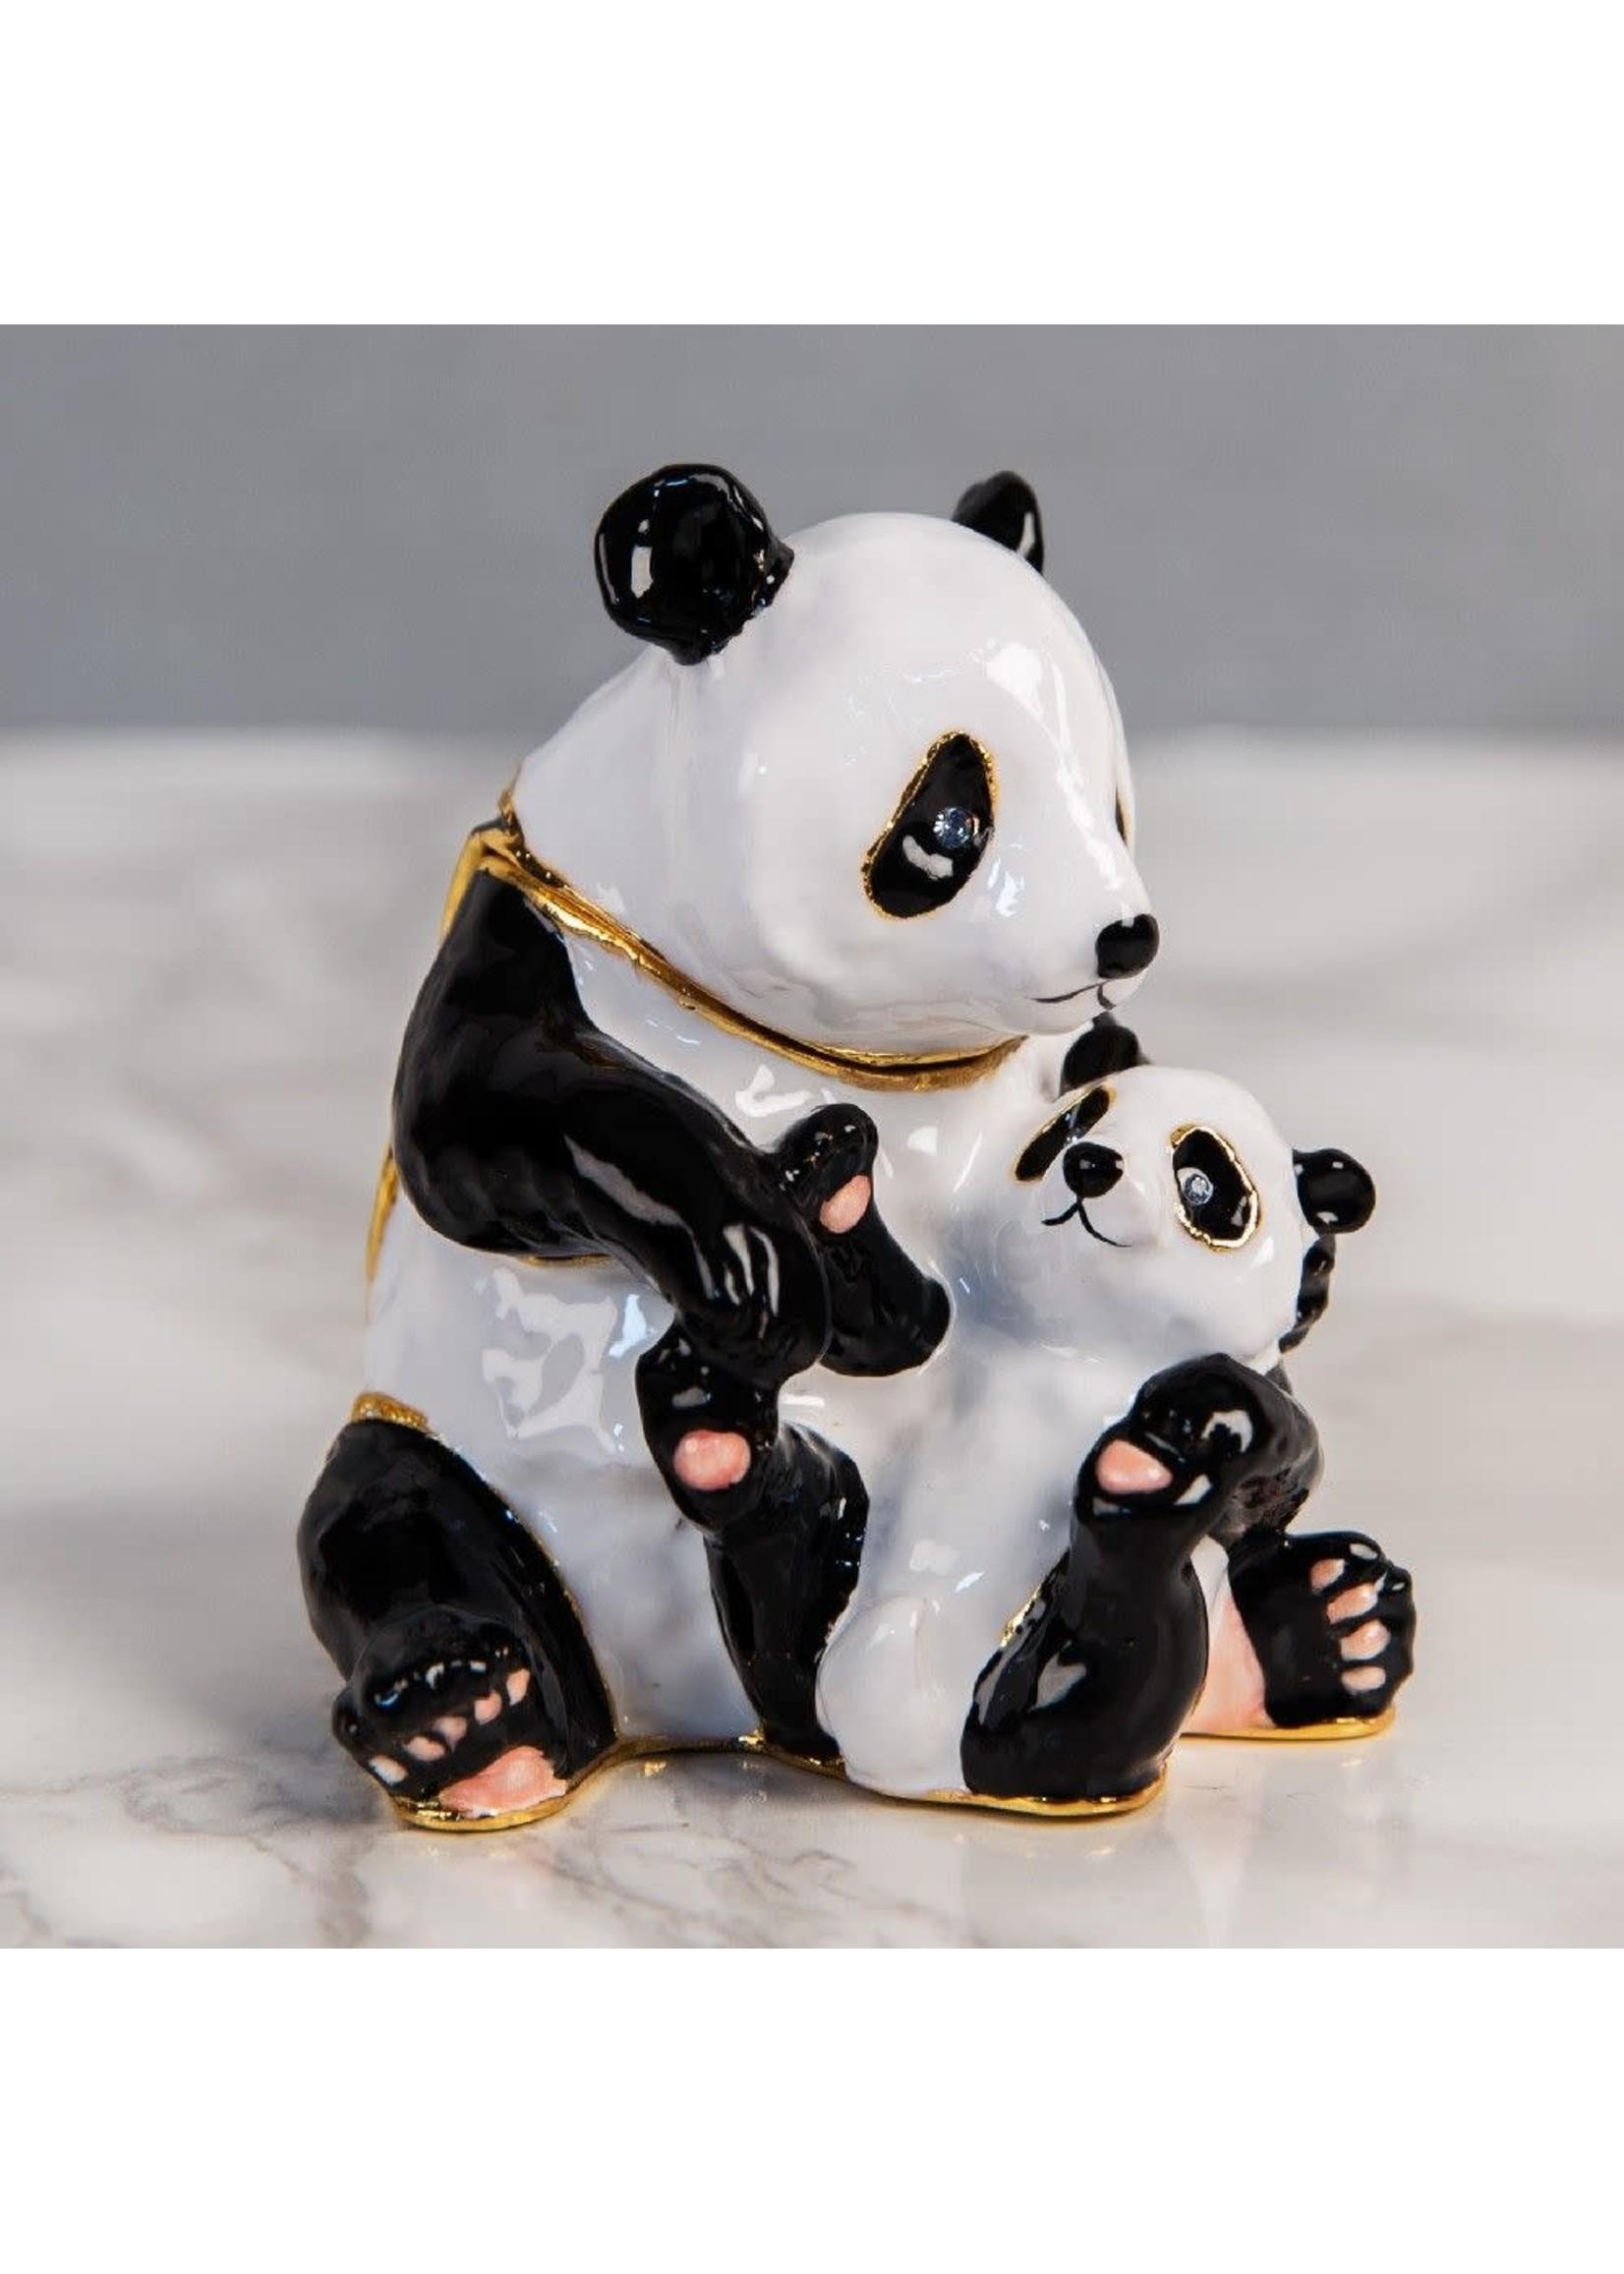 TREASURED TRINKETS - PANDA AND BABY